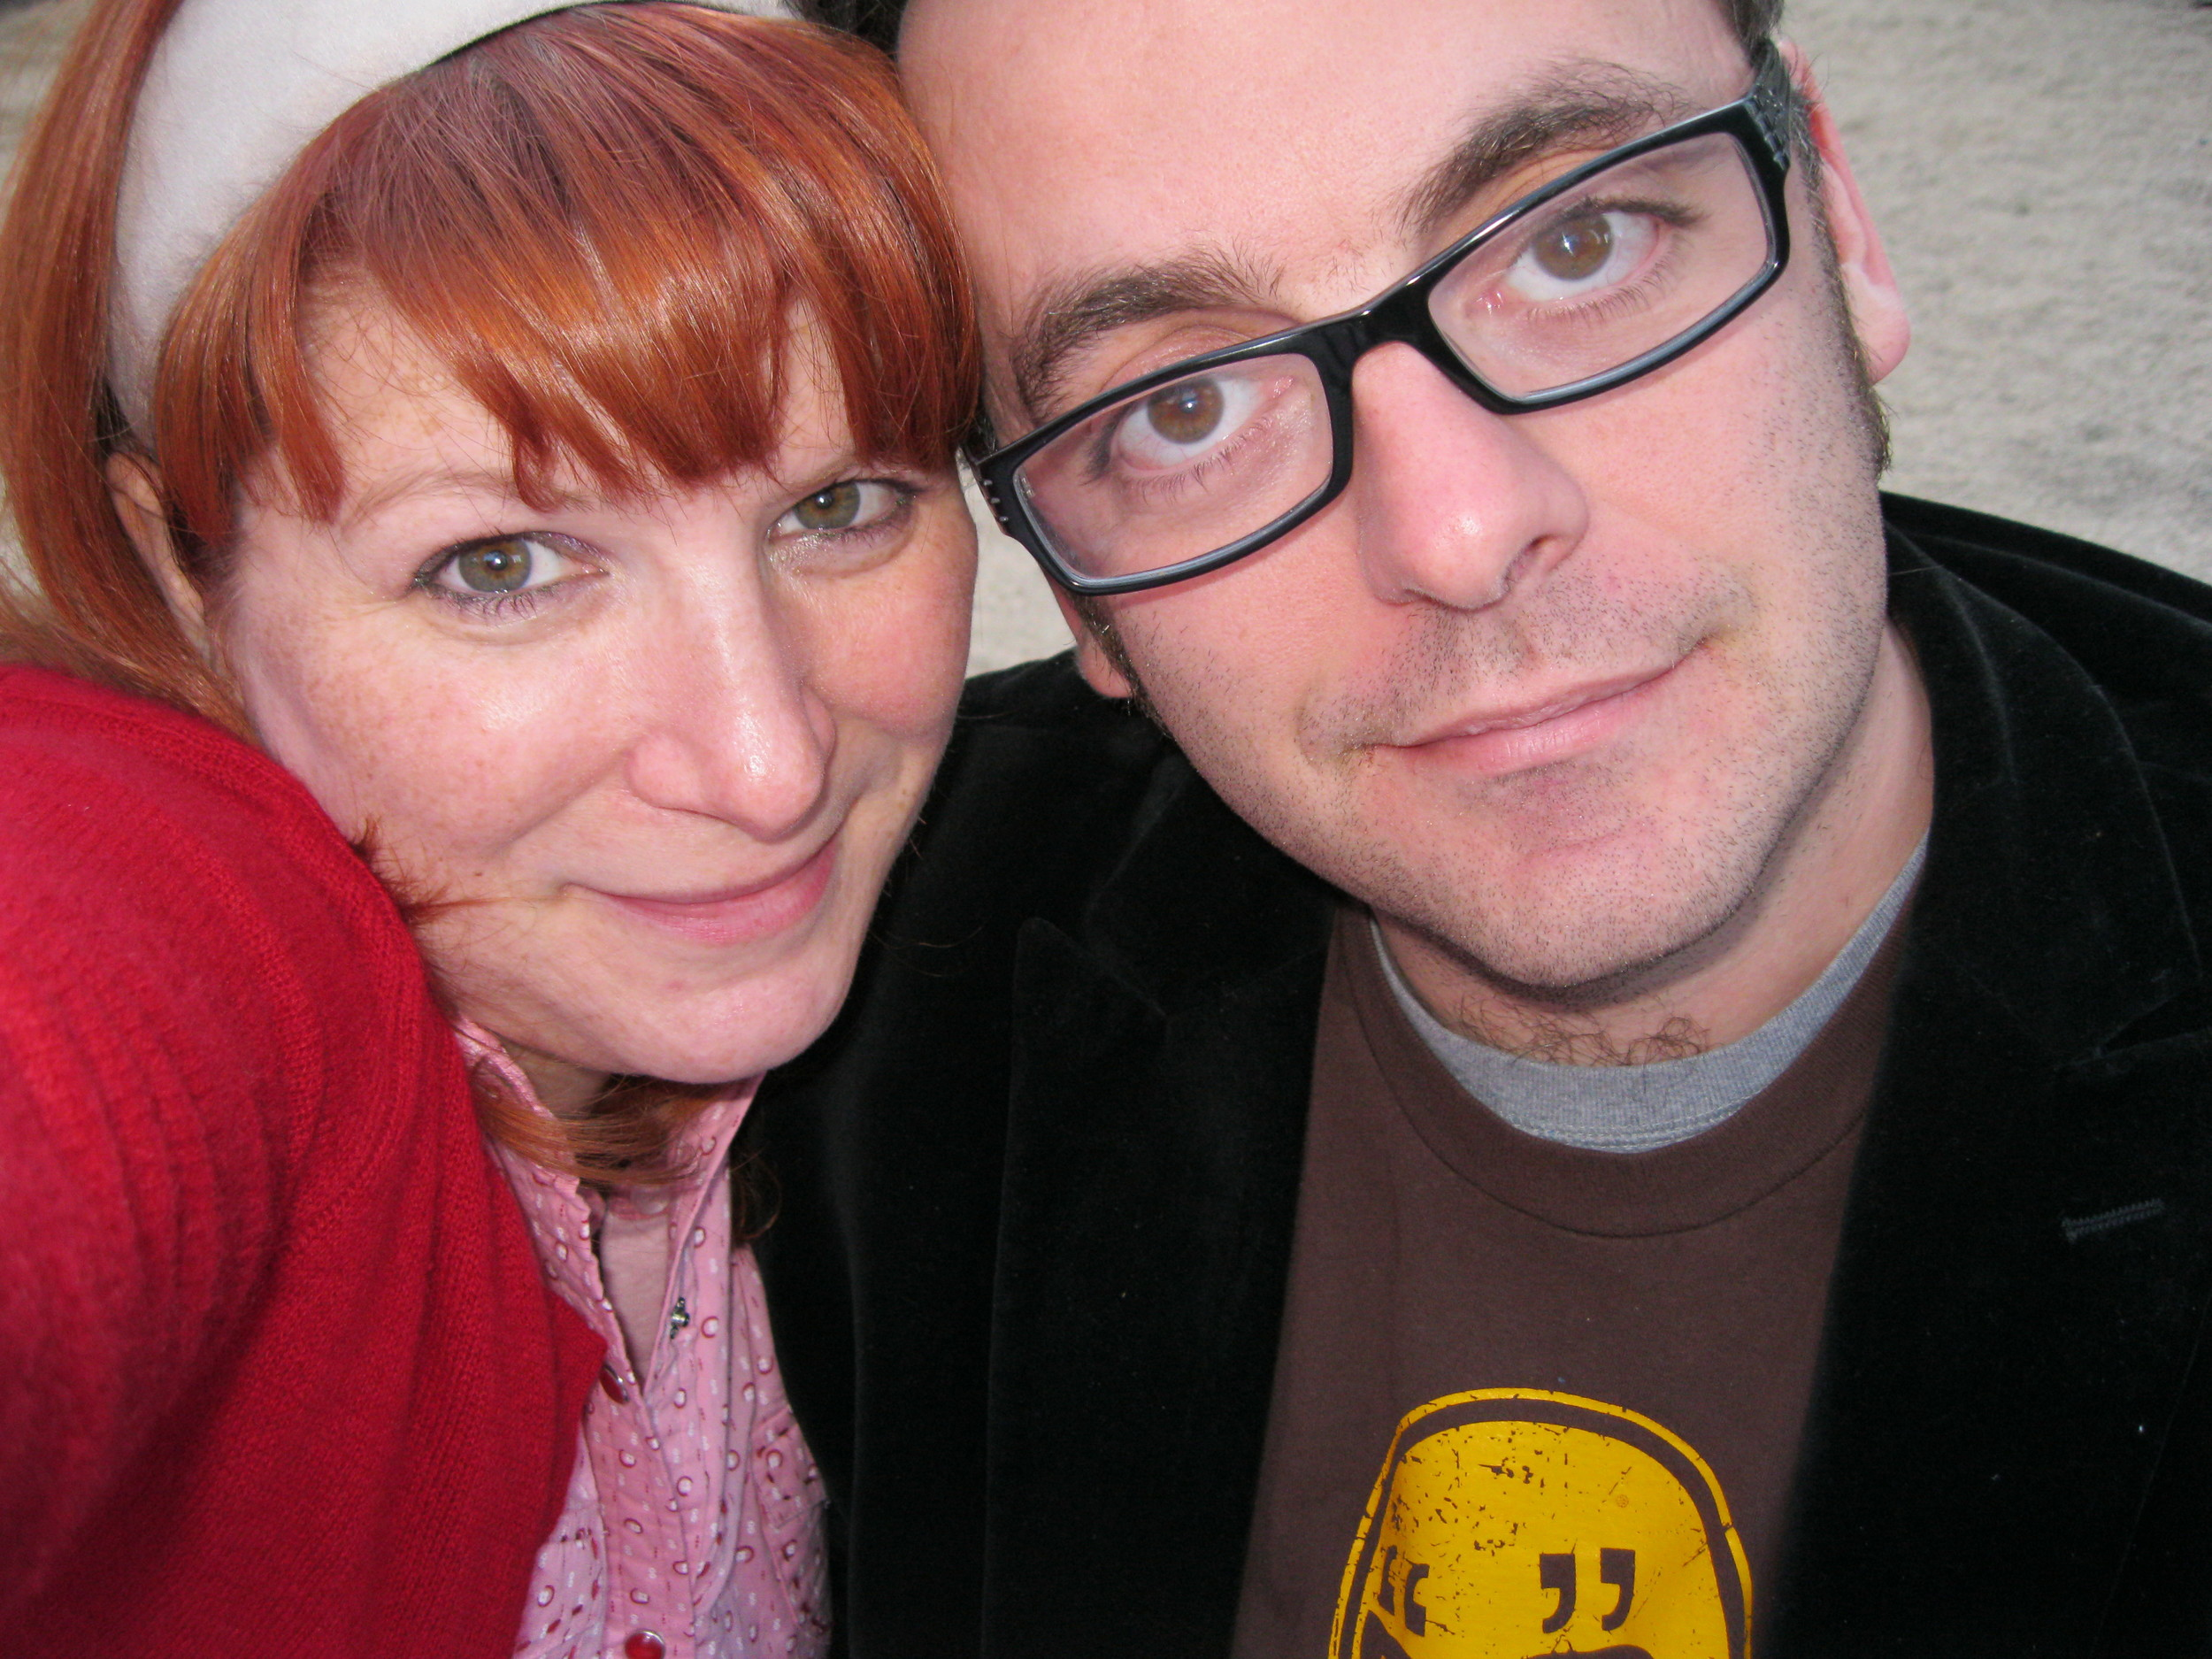 Josh and Kayla Cagan